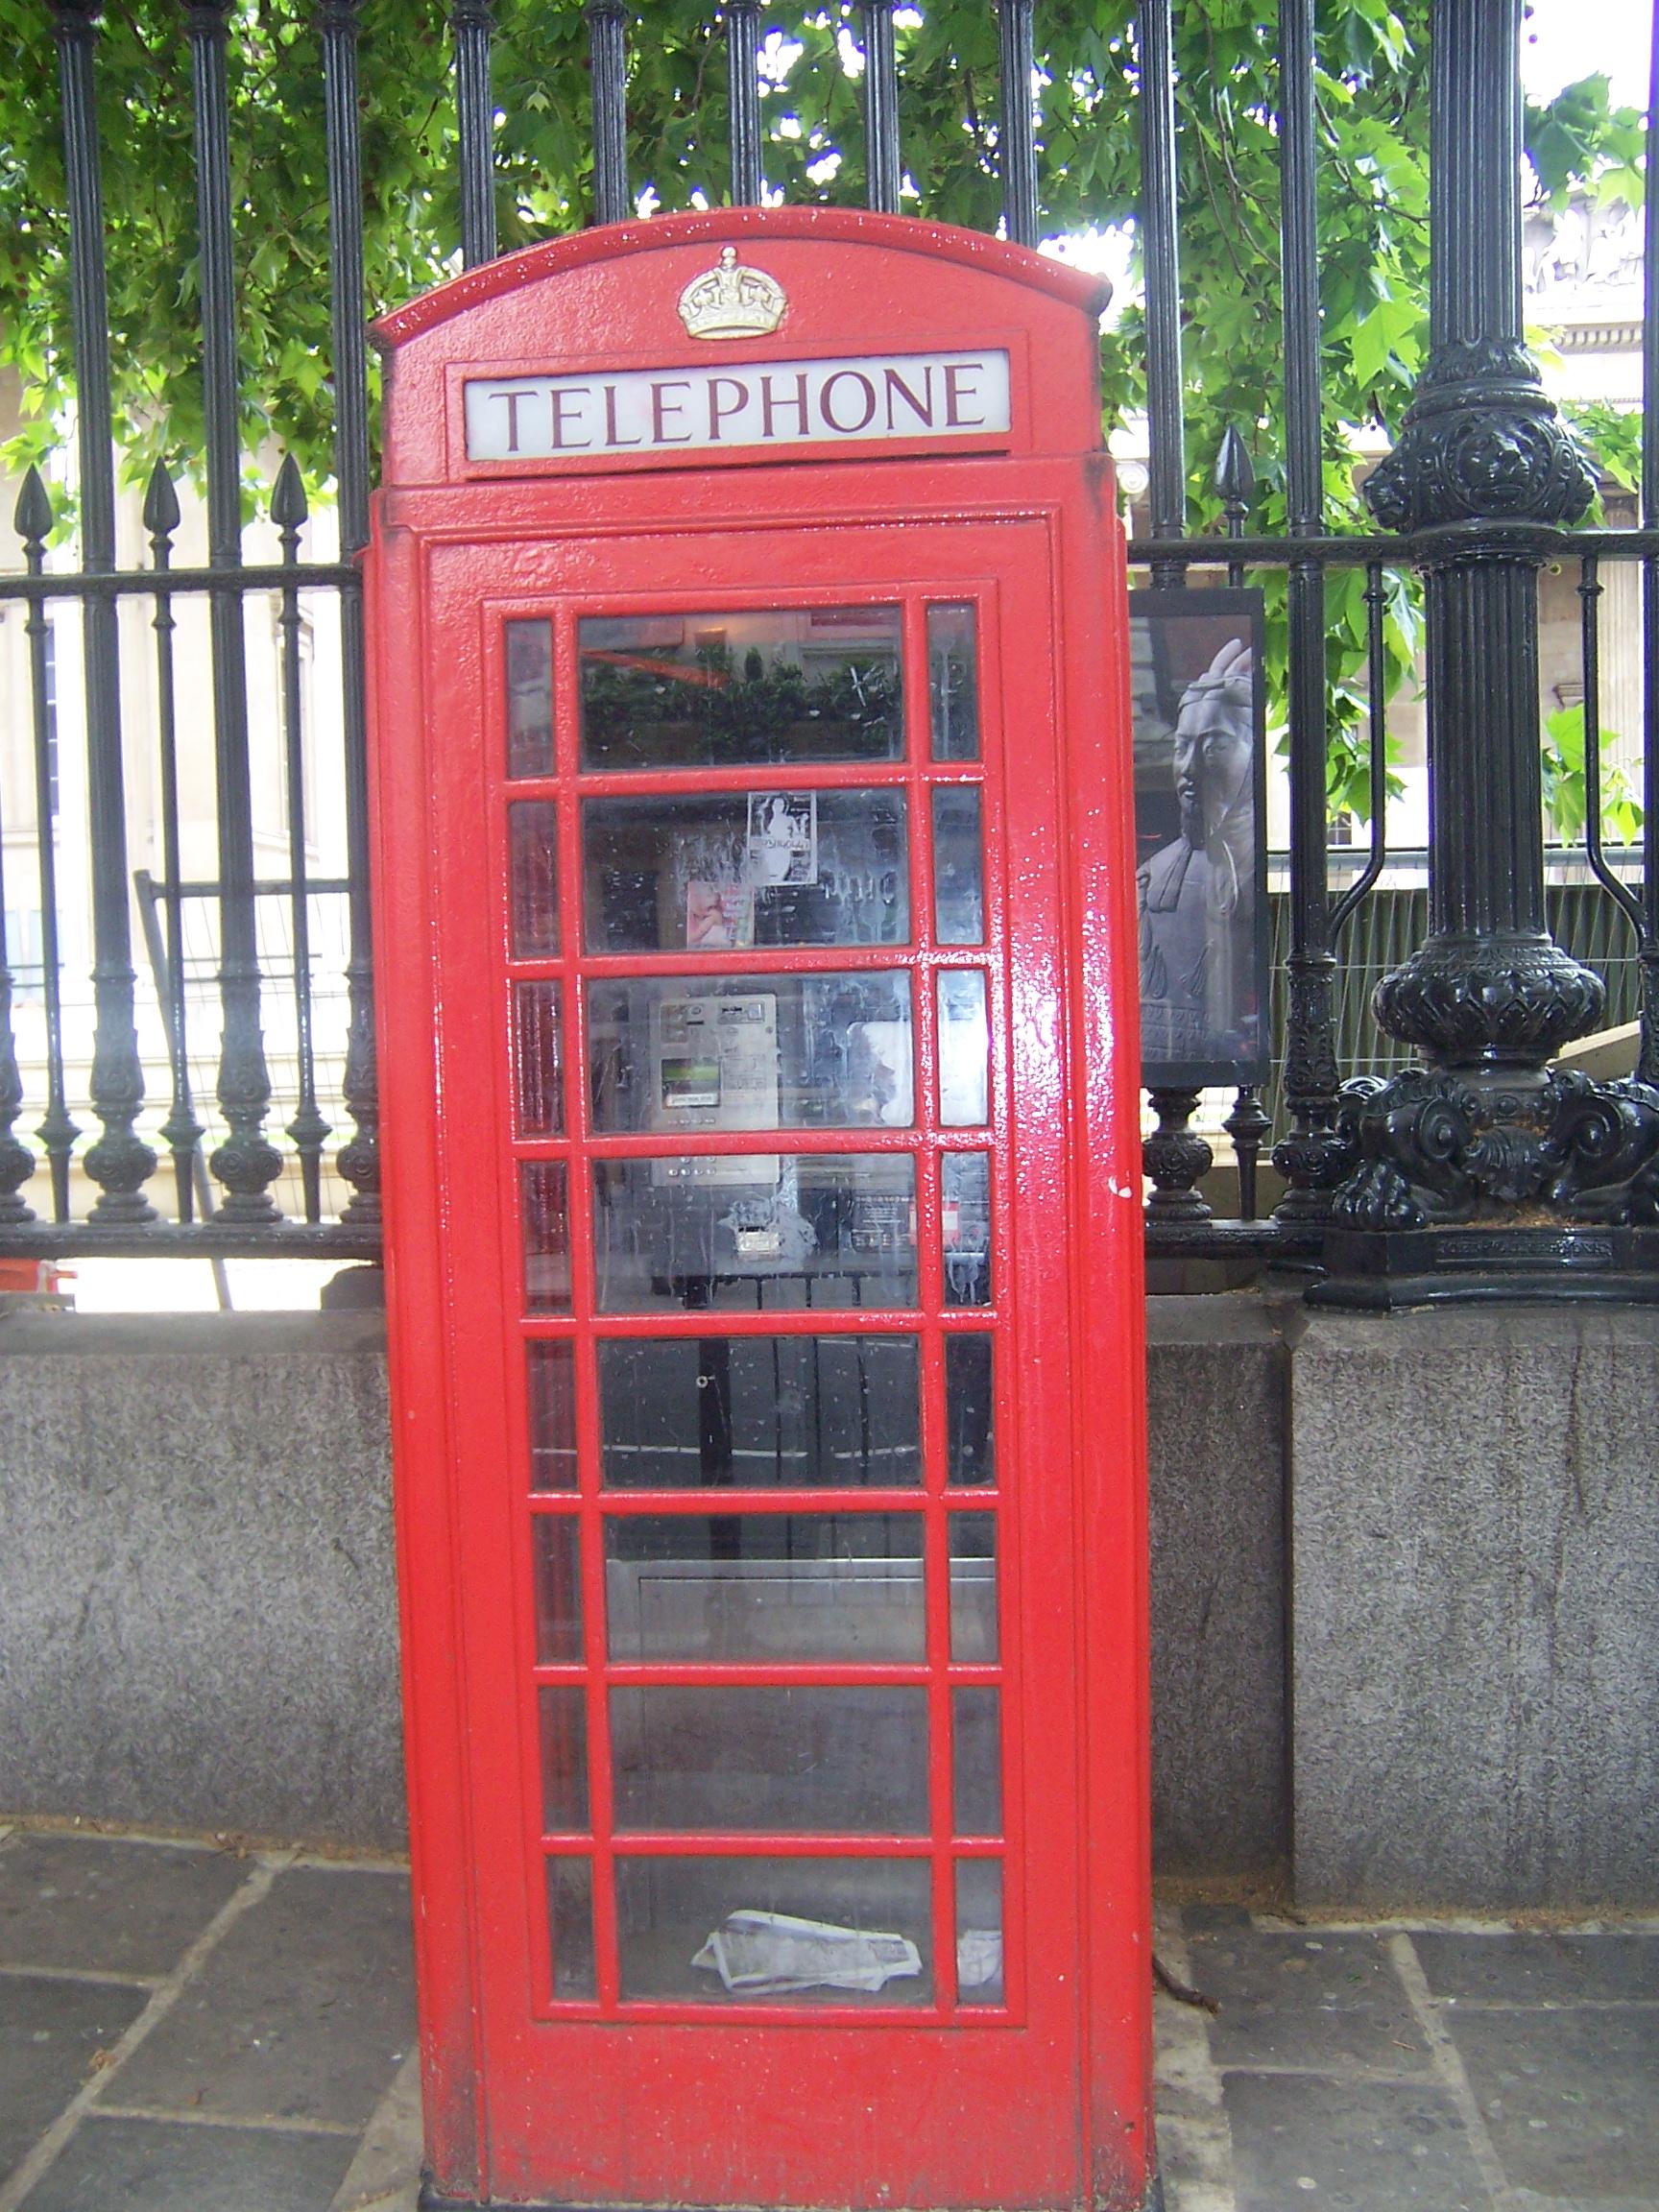 Fileengelse Telefoonceljpg Wikimedia Commons